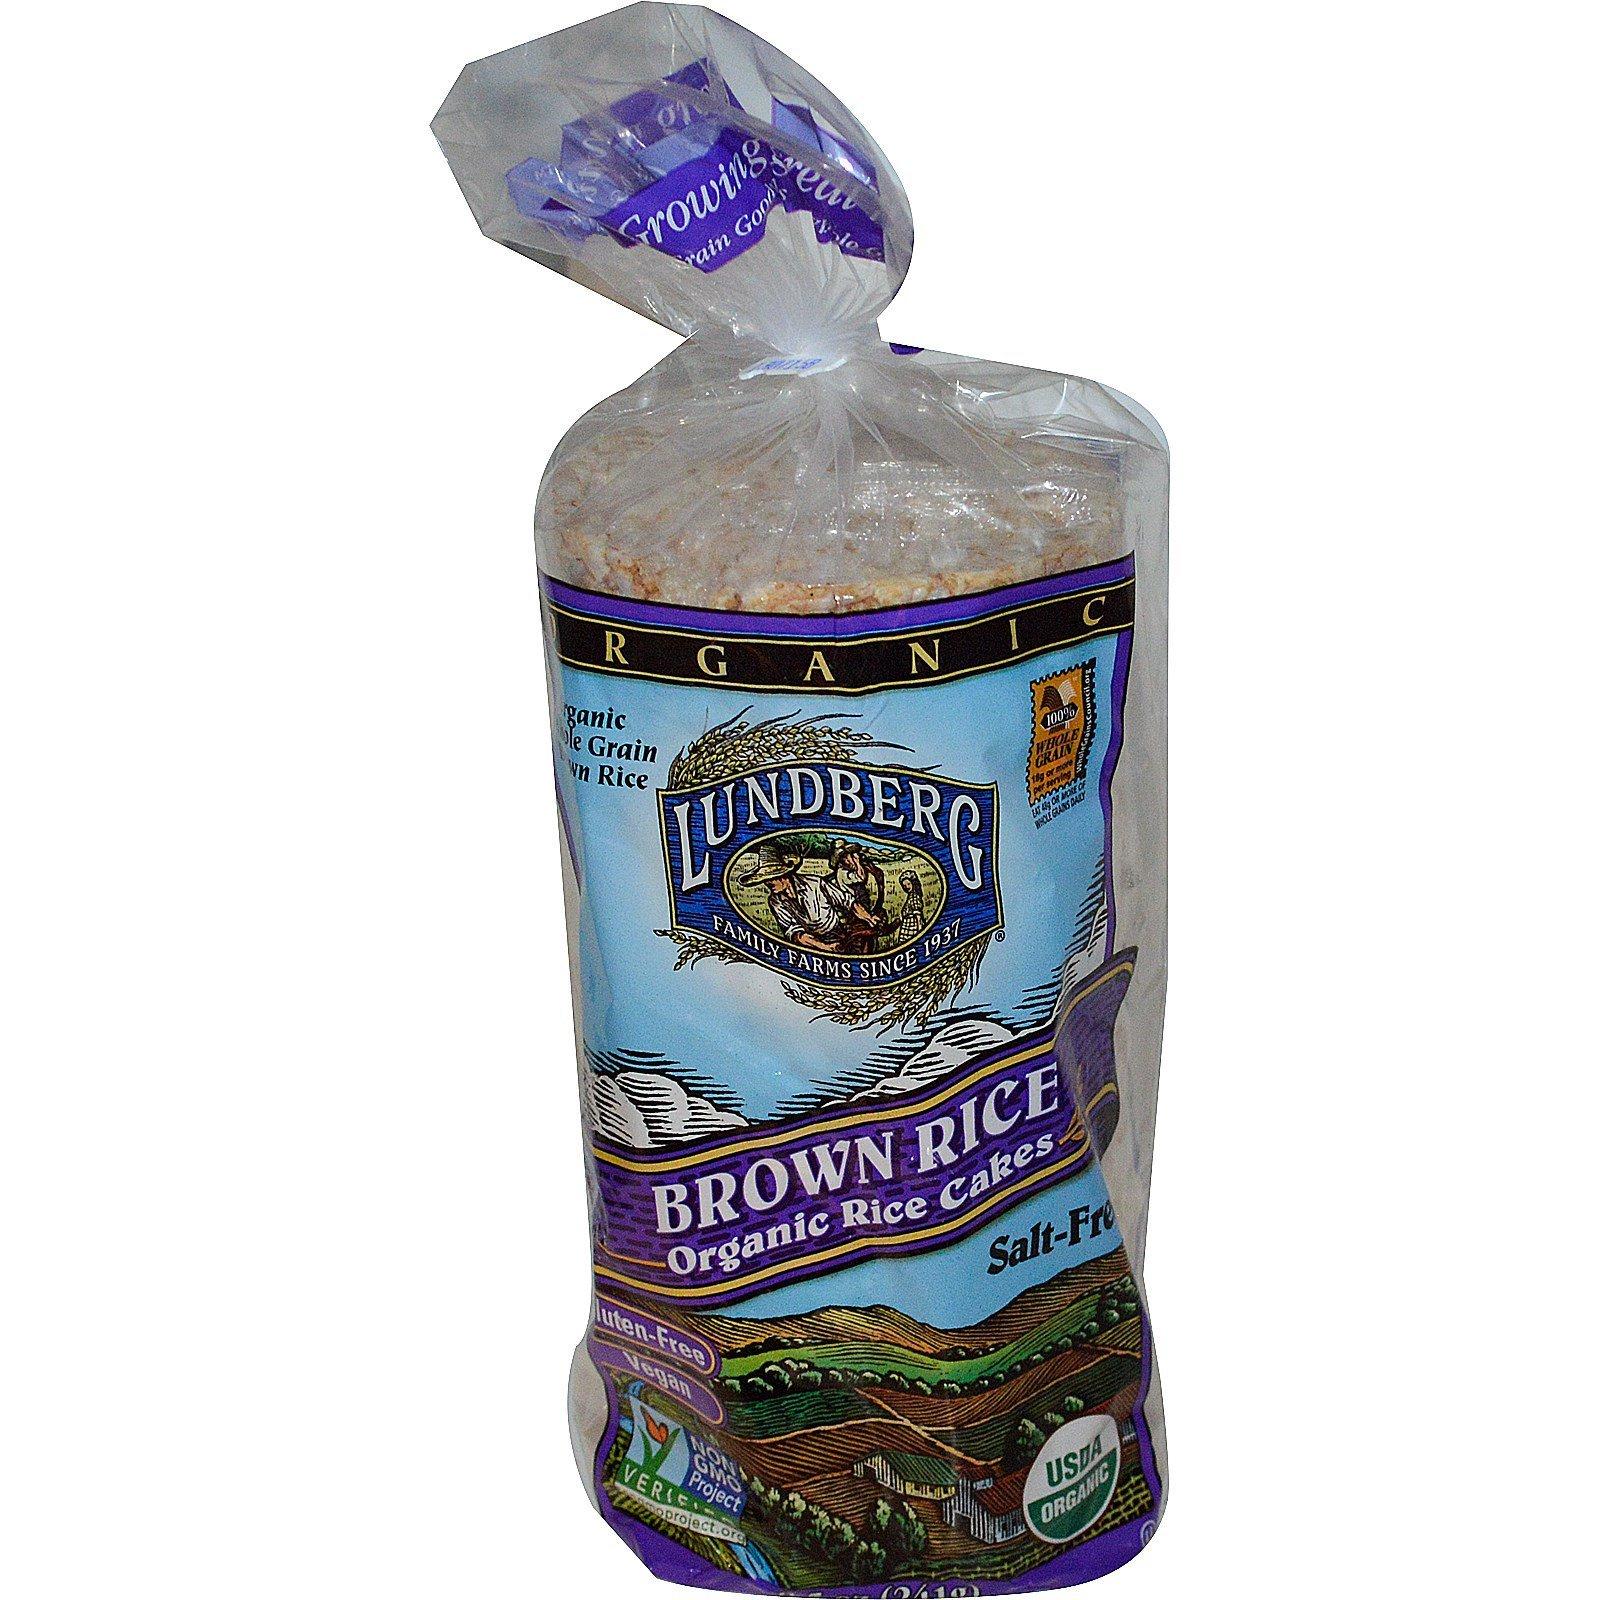 Lundberg, Brown Rice Organic Rice Cakes, Salt Free, 8.5 oz(Pack of 3)